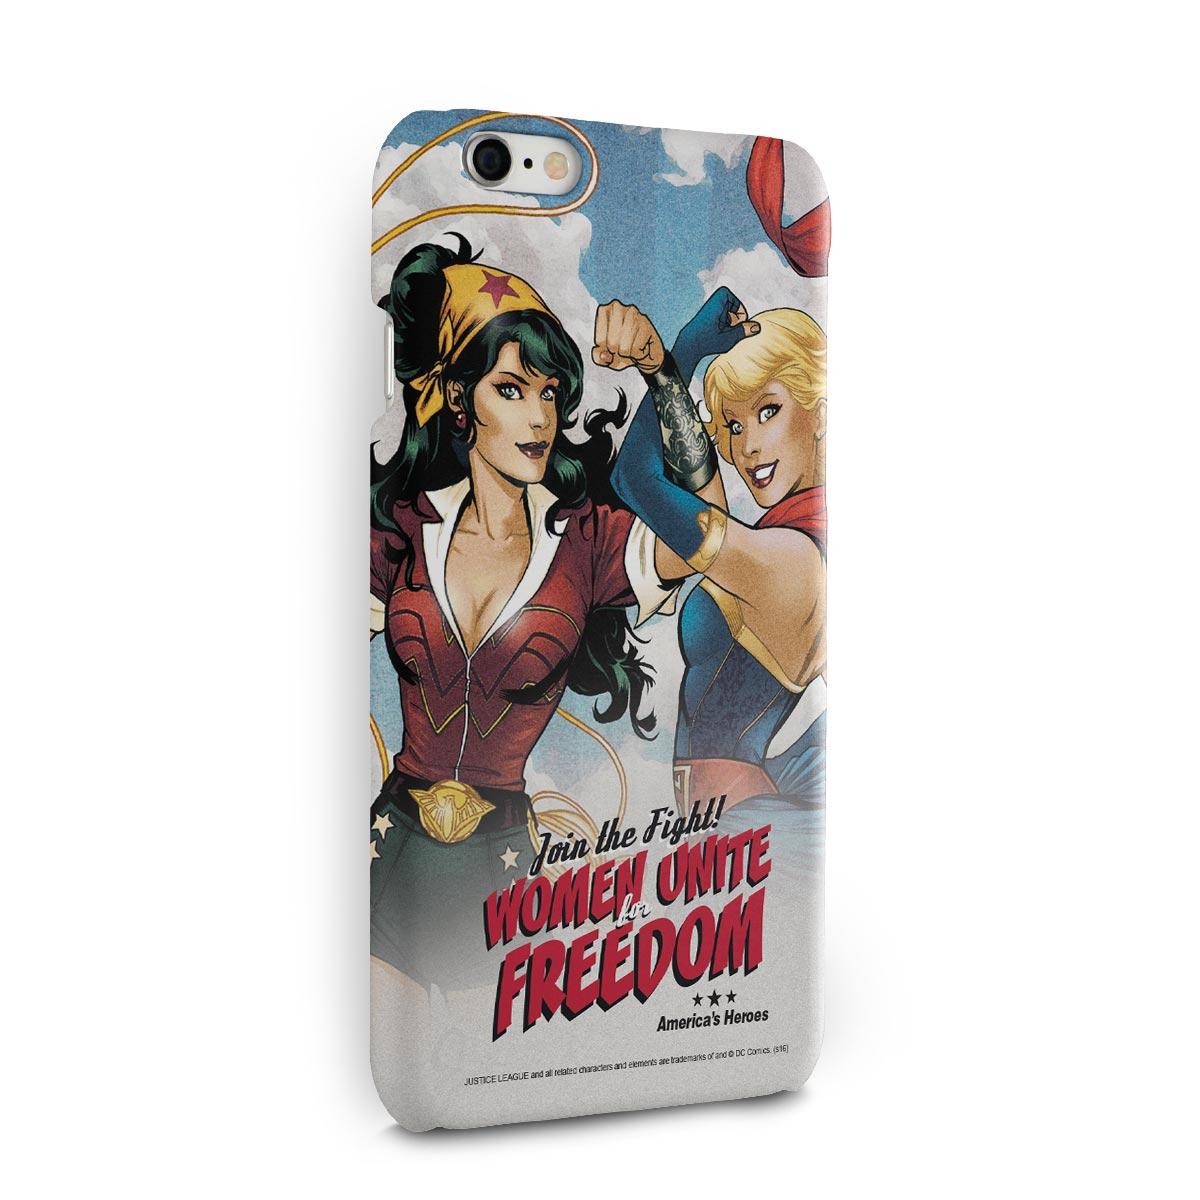 Capa para iPhone 6/6S Women Unite for Freedom